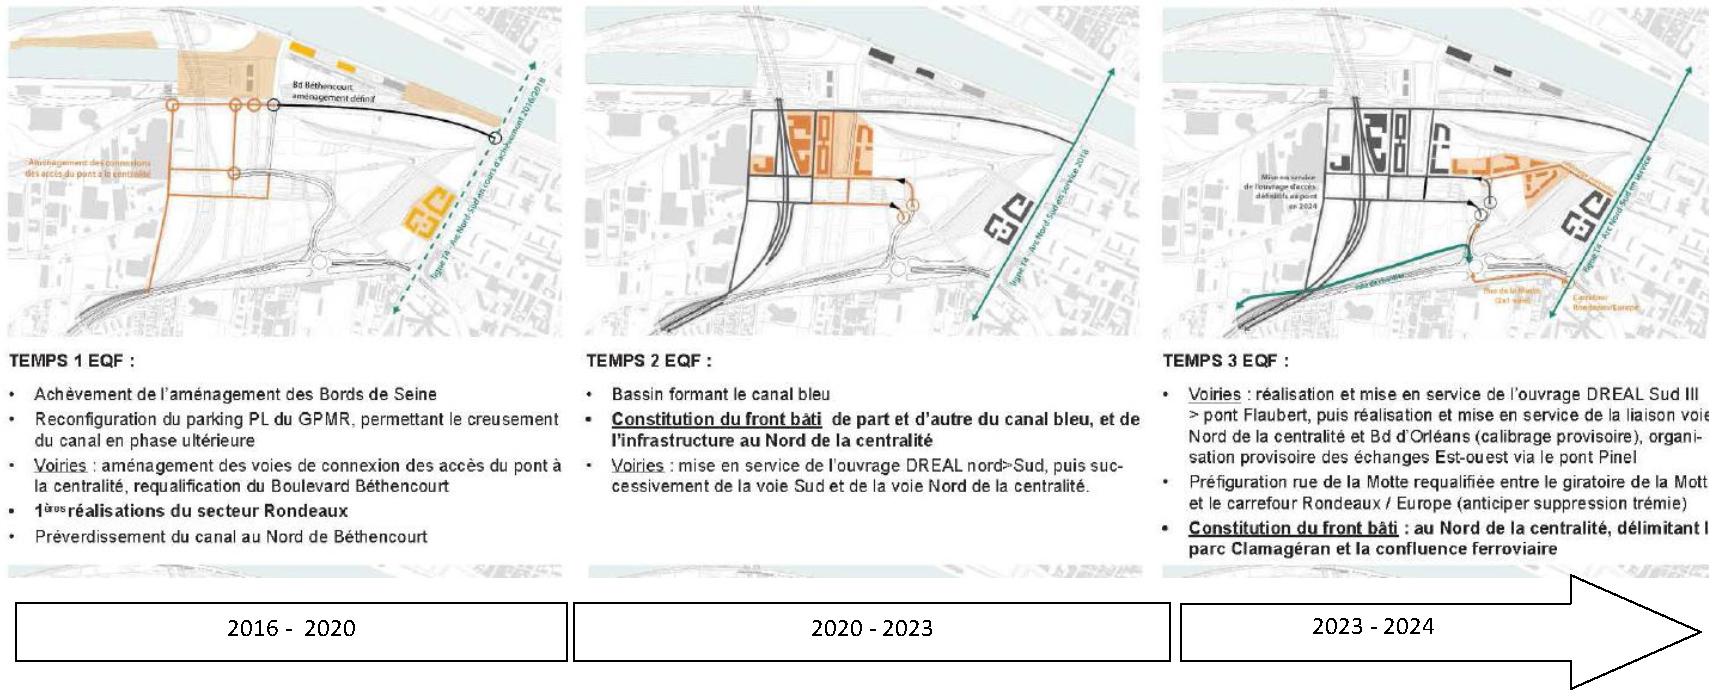 [Bientôt visible sur Google Earth] - Rouen - Ecoquartier Flaubert Ph110